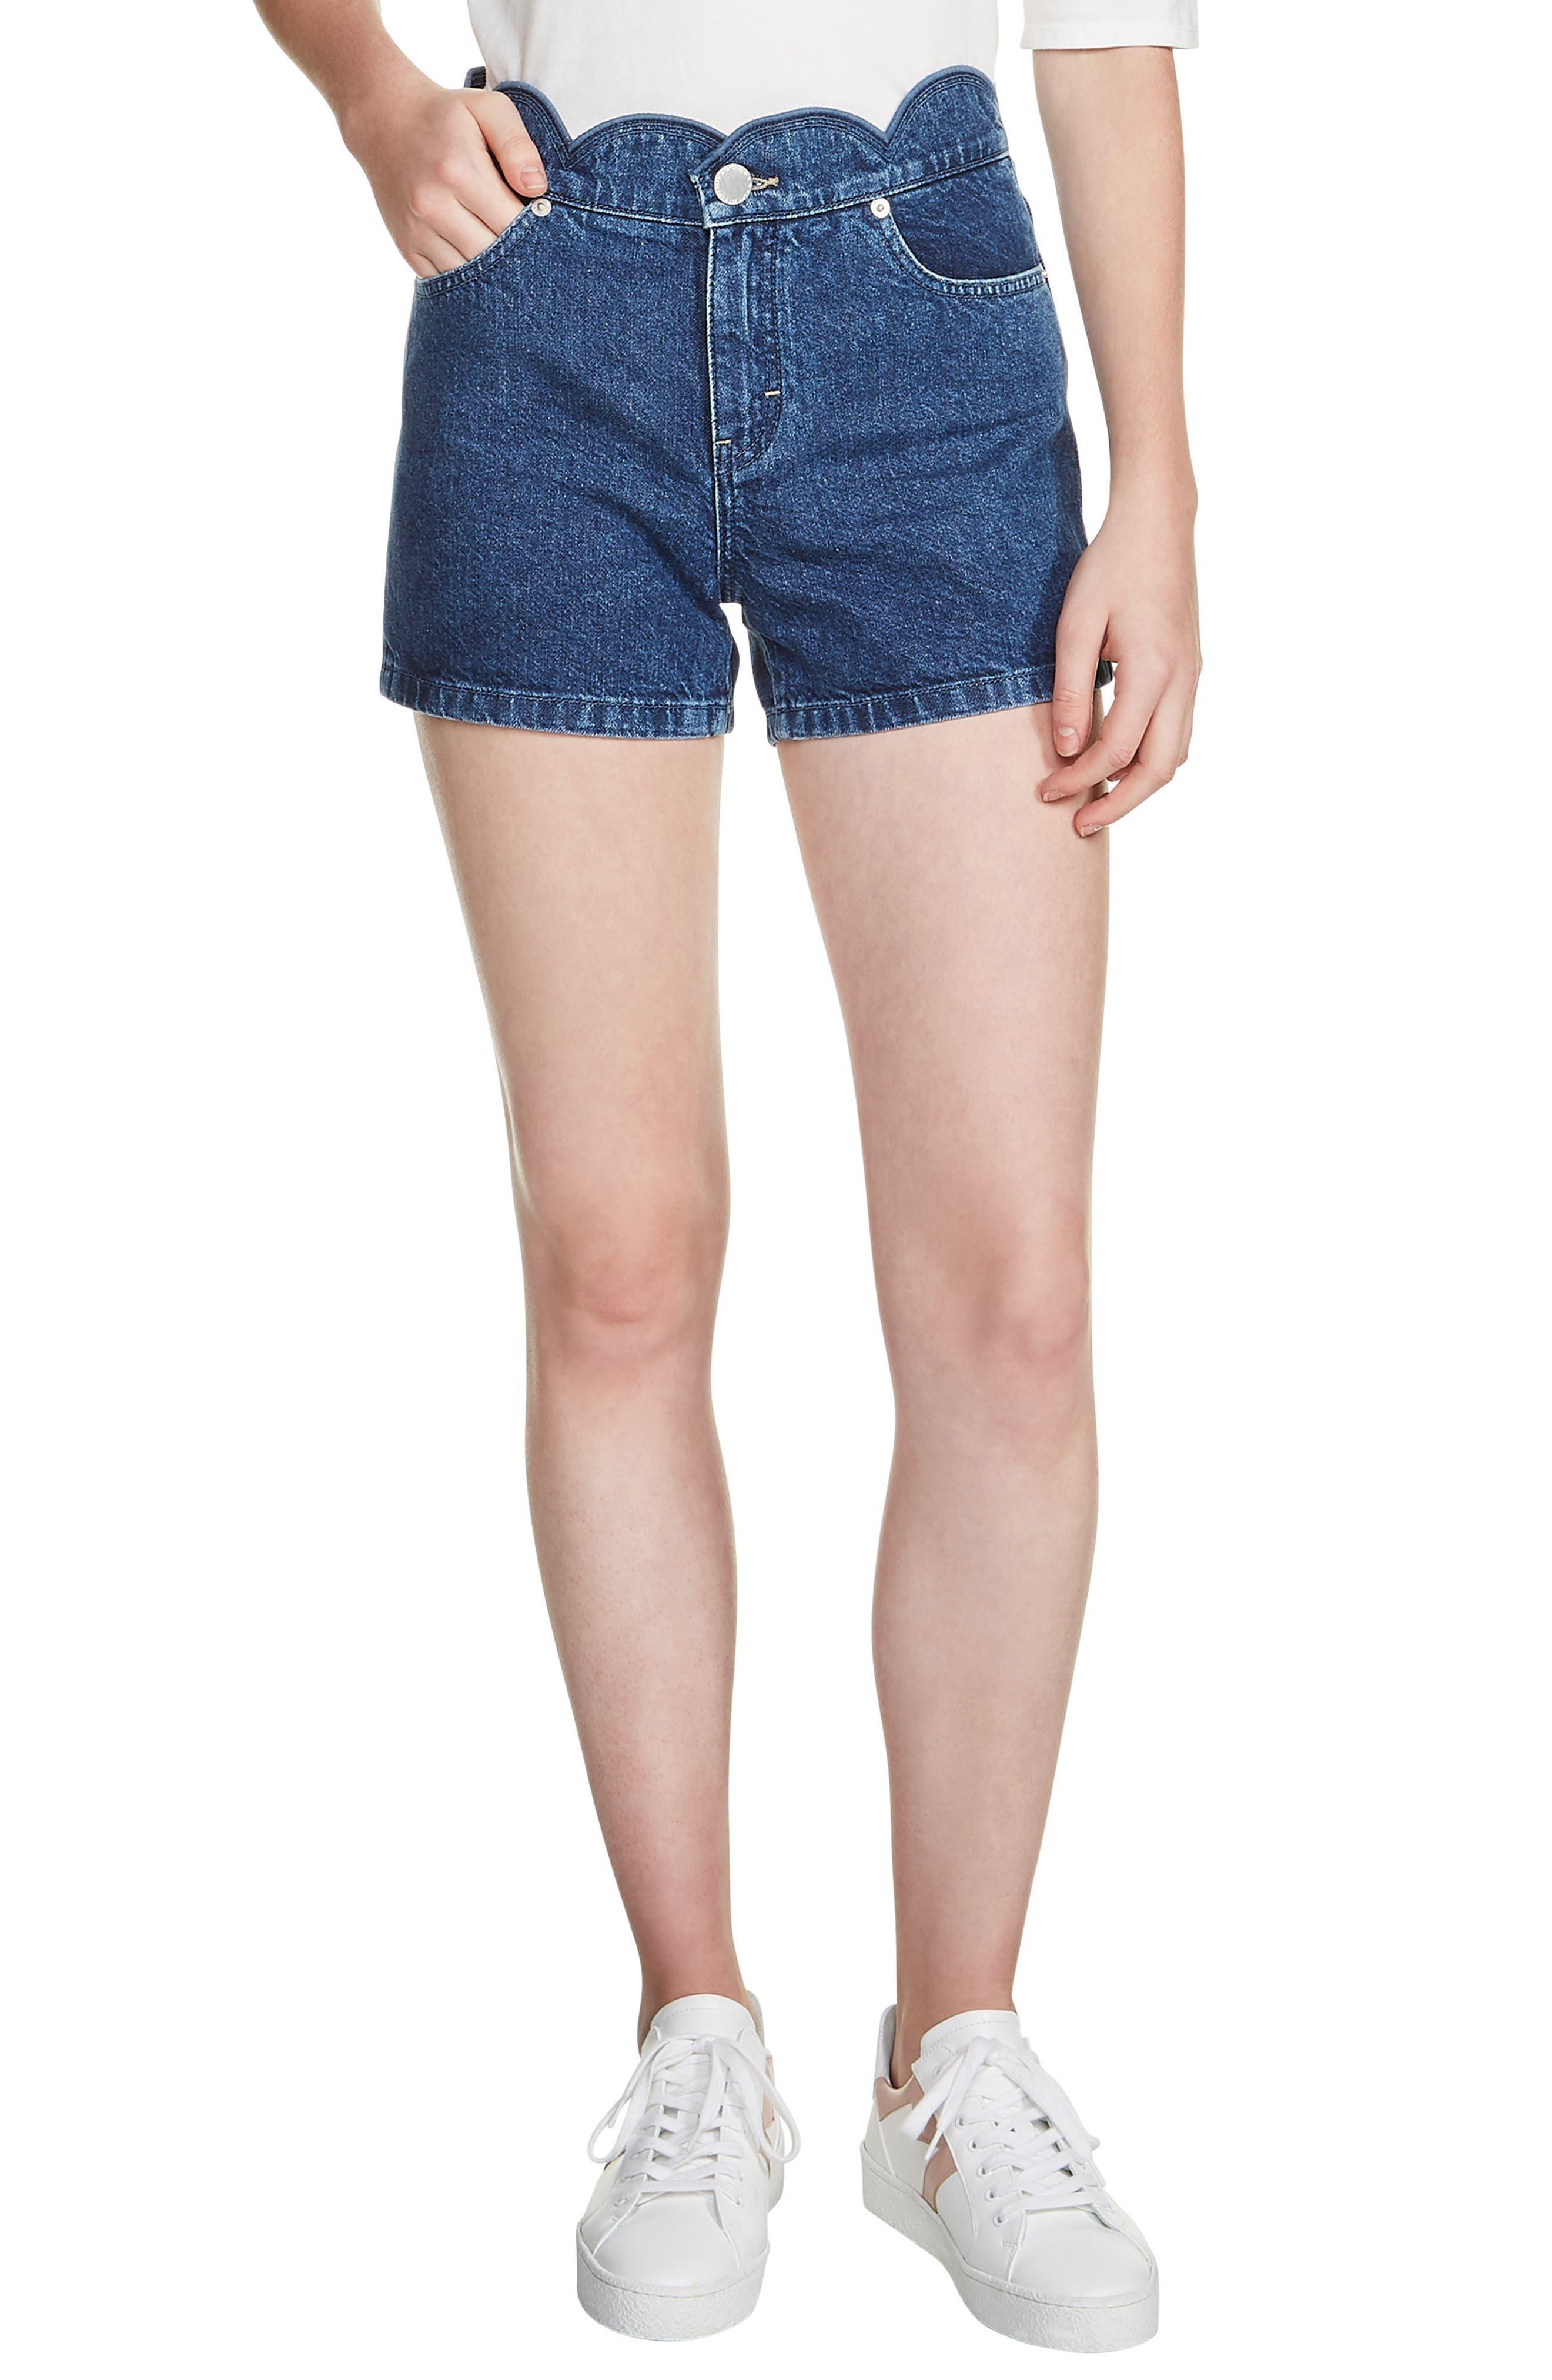 Shafti Scallop Waist Denim Shorts,                             Main thumbnail 1, color,                             400